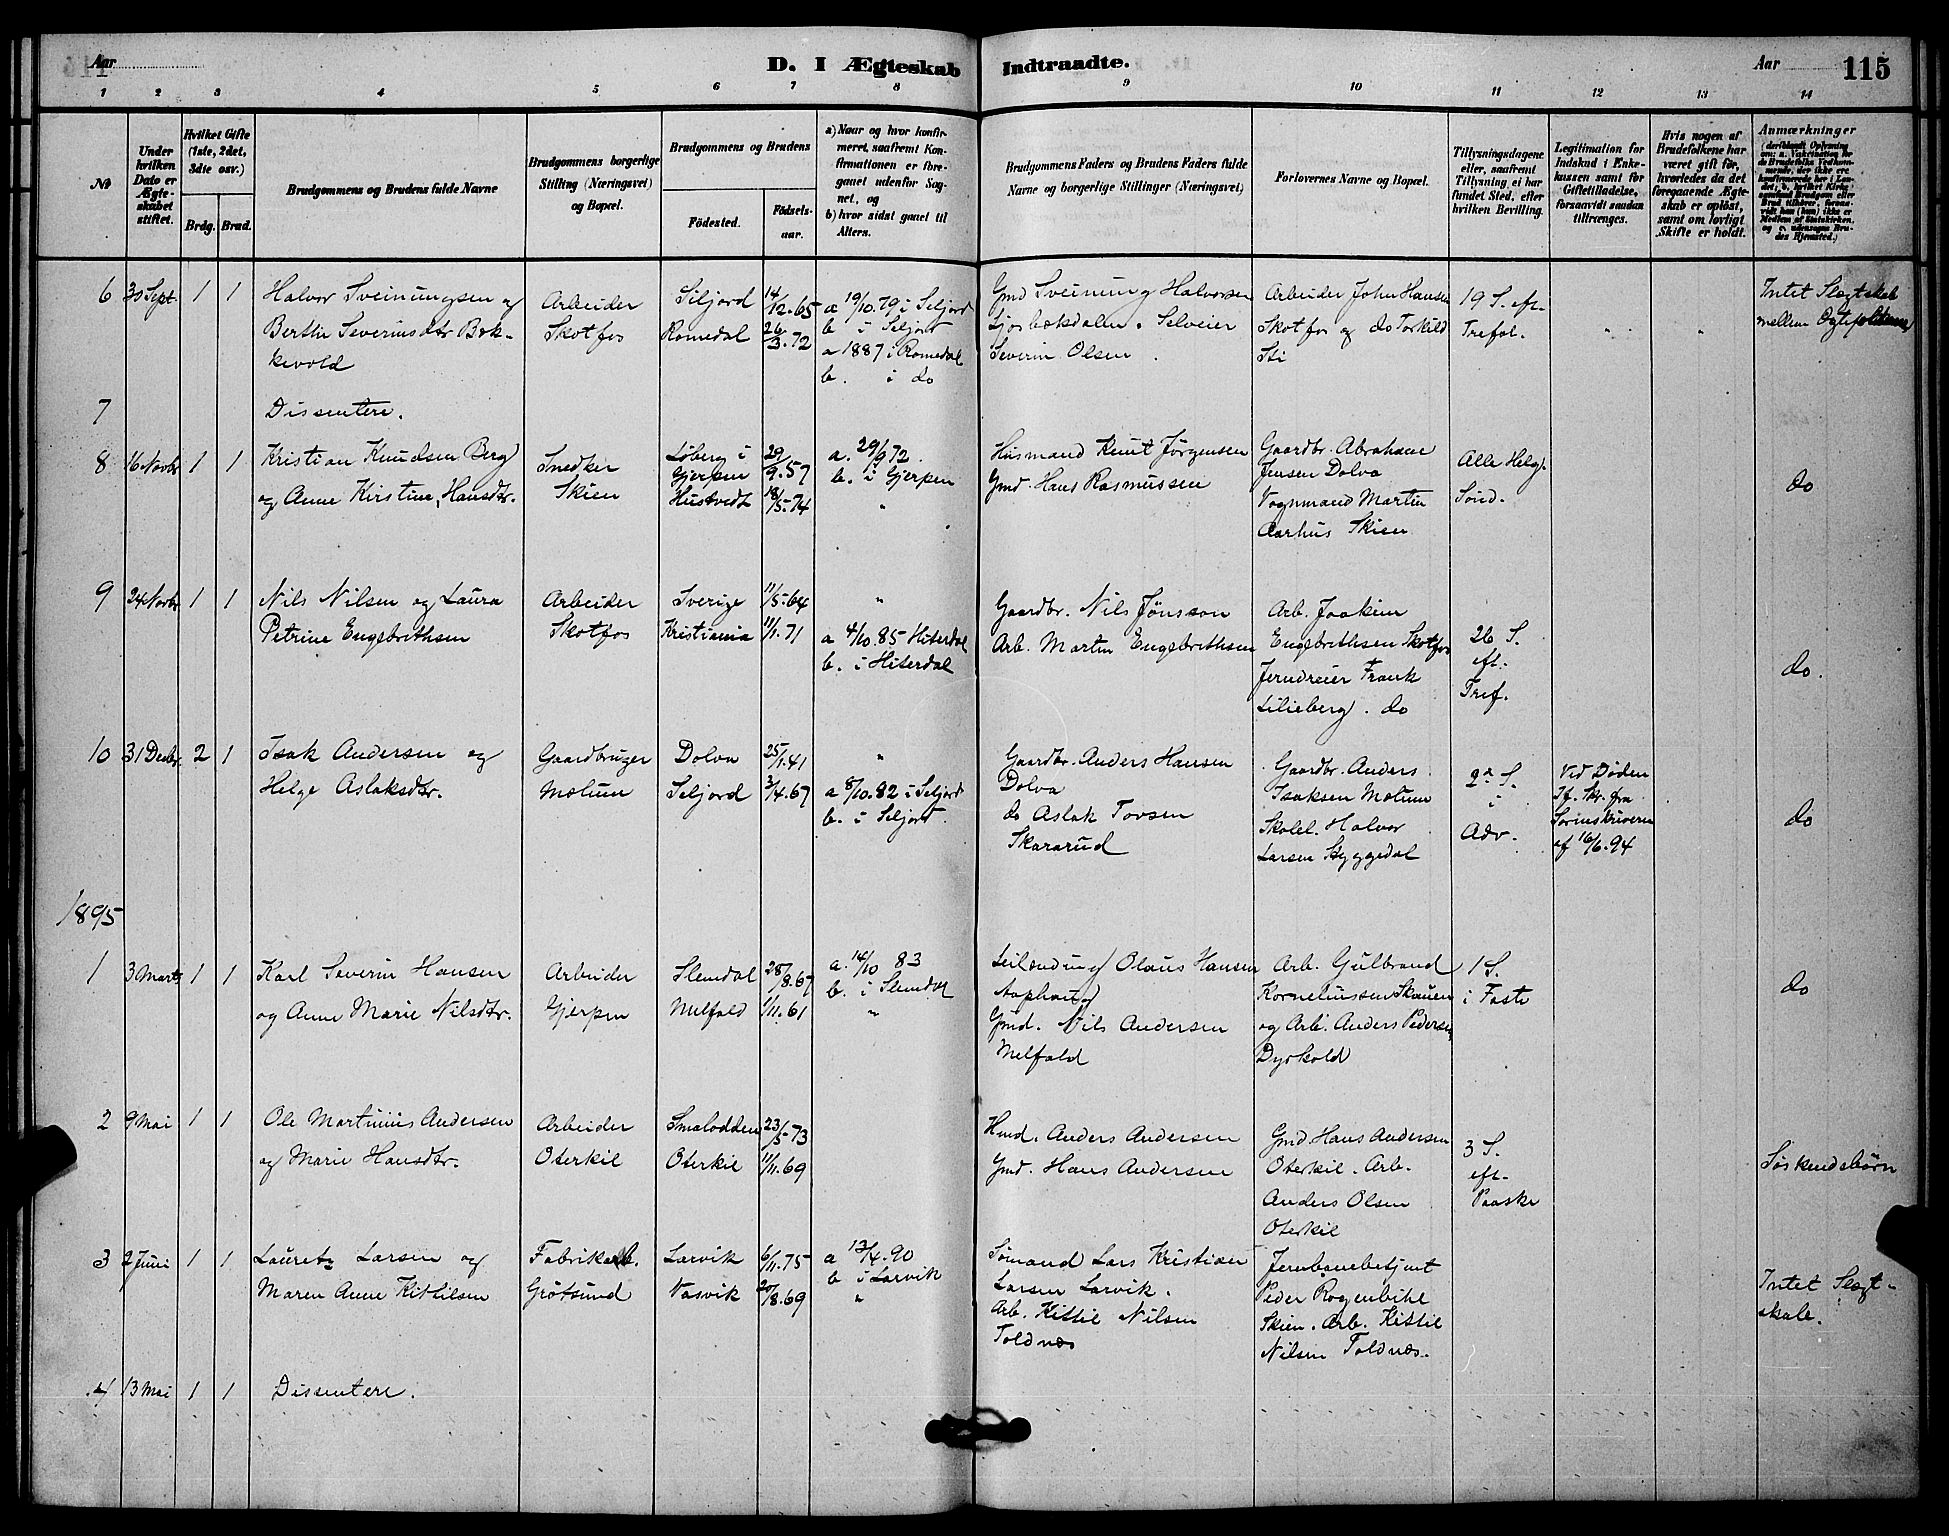 SAKO, Solum kirkebøker, G/Gb/L0003: Klokkerbok nr. II 3, 1880-1898, s. 115